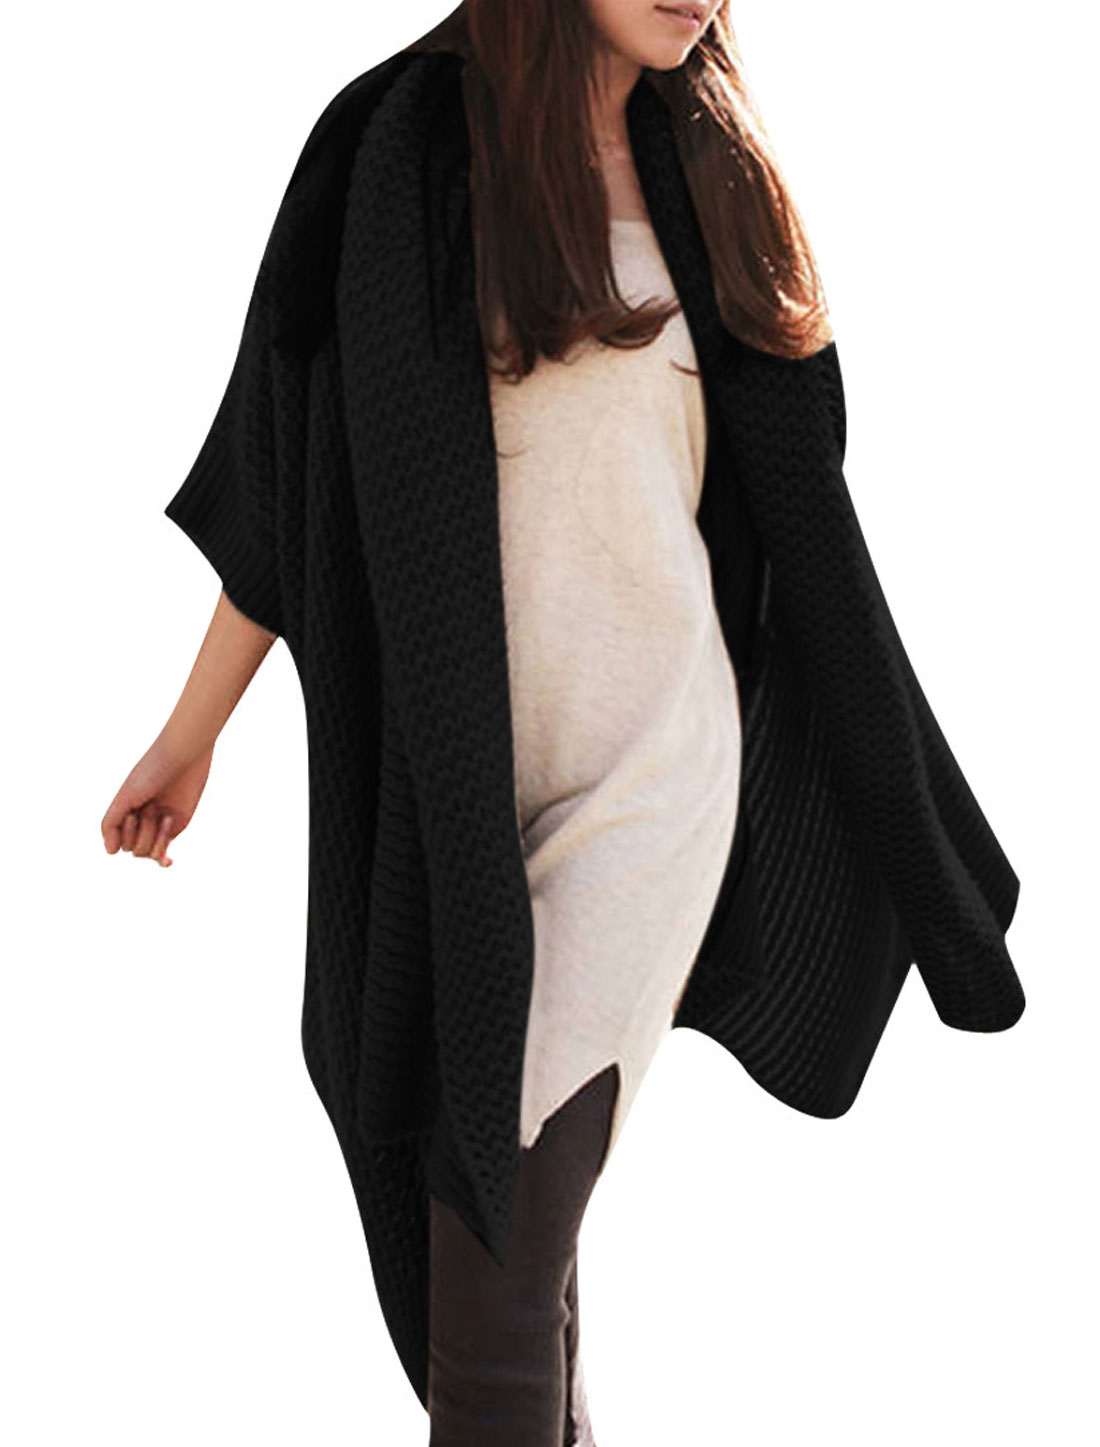 Ladies Stylish Pure Black Color Irregular Hem Draped Sweater Coat M